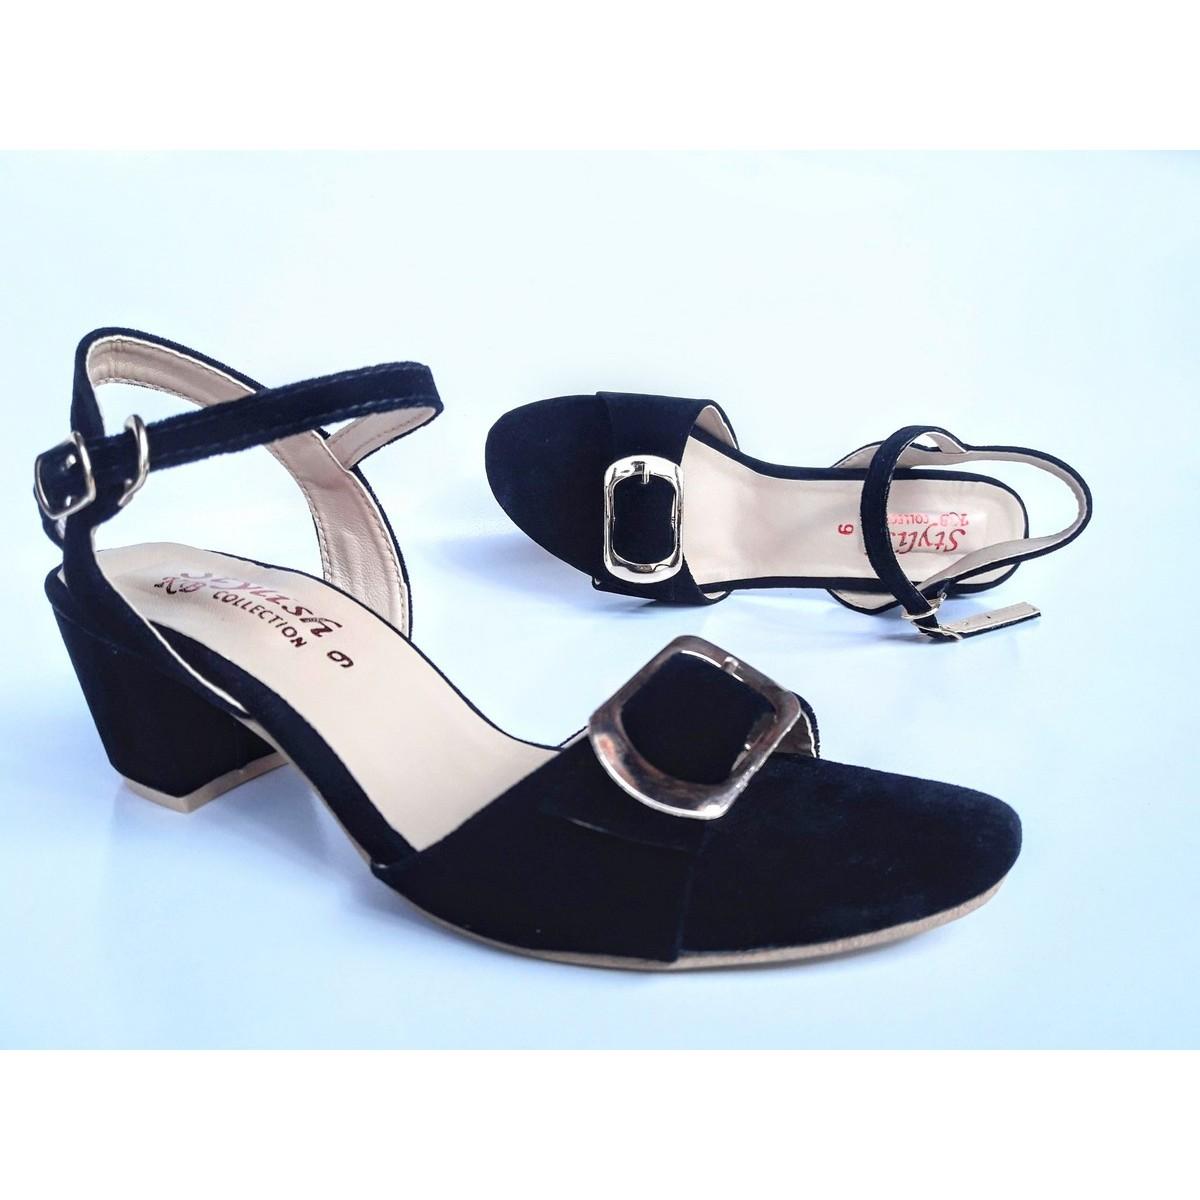 Stylish block heel sandals for women